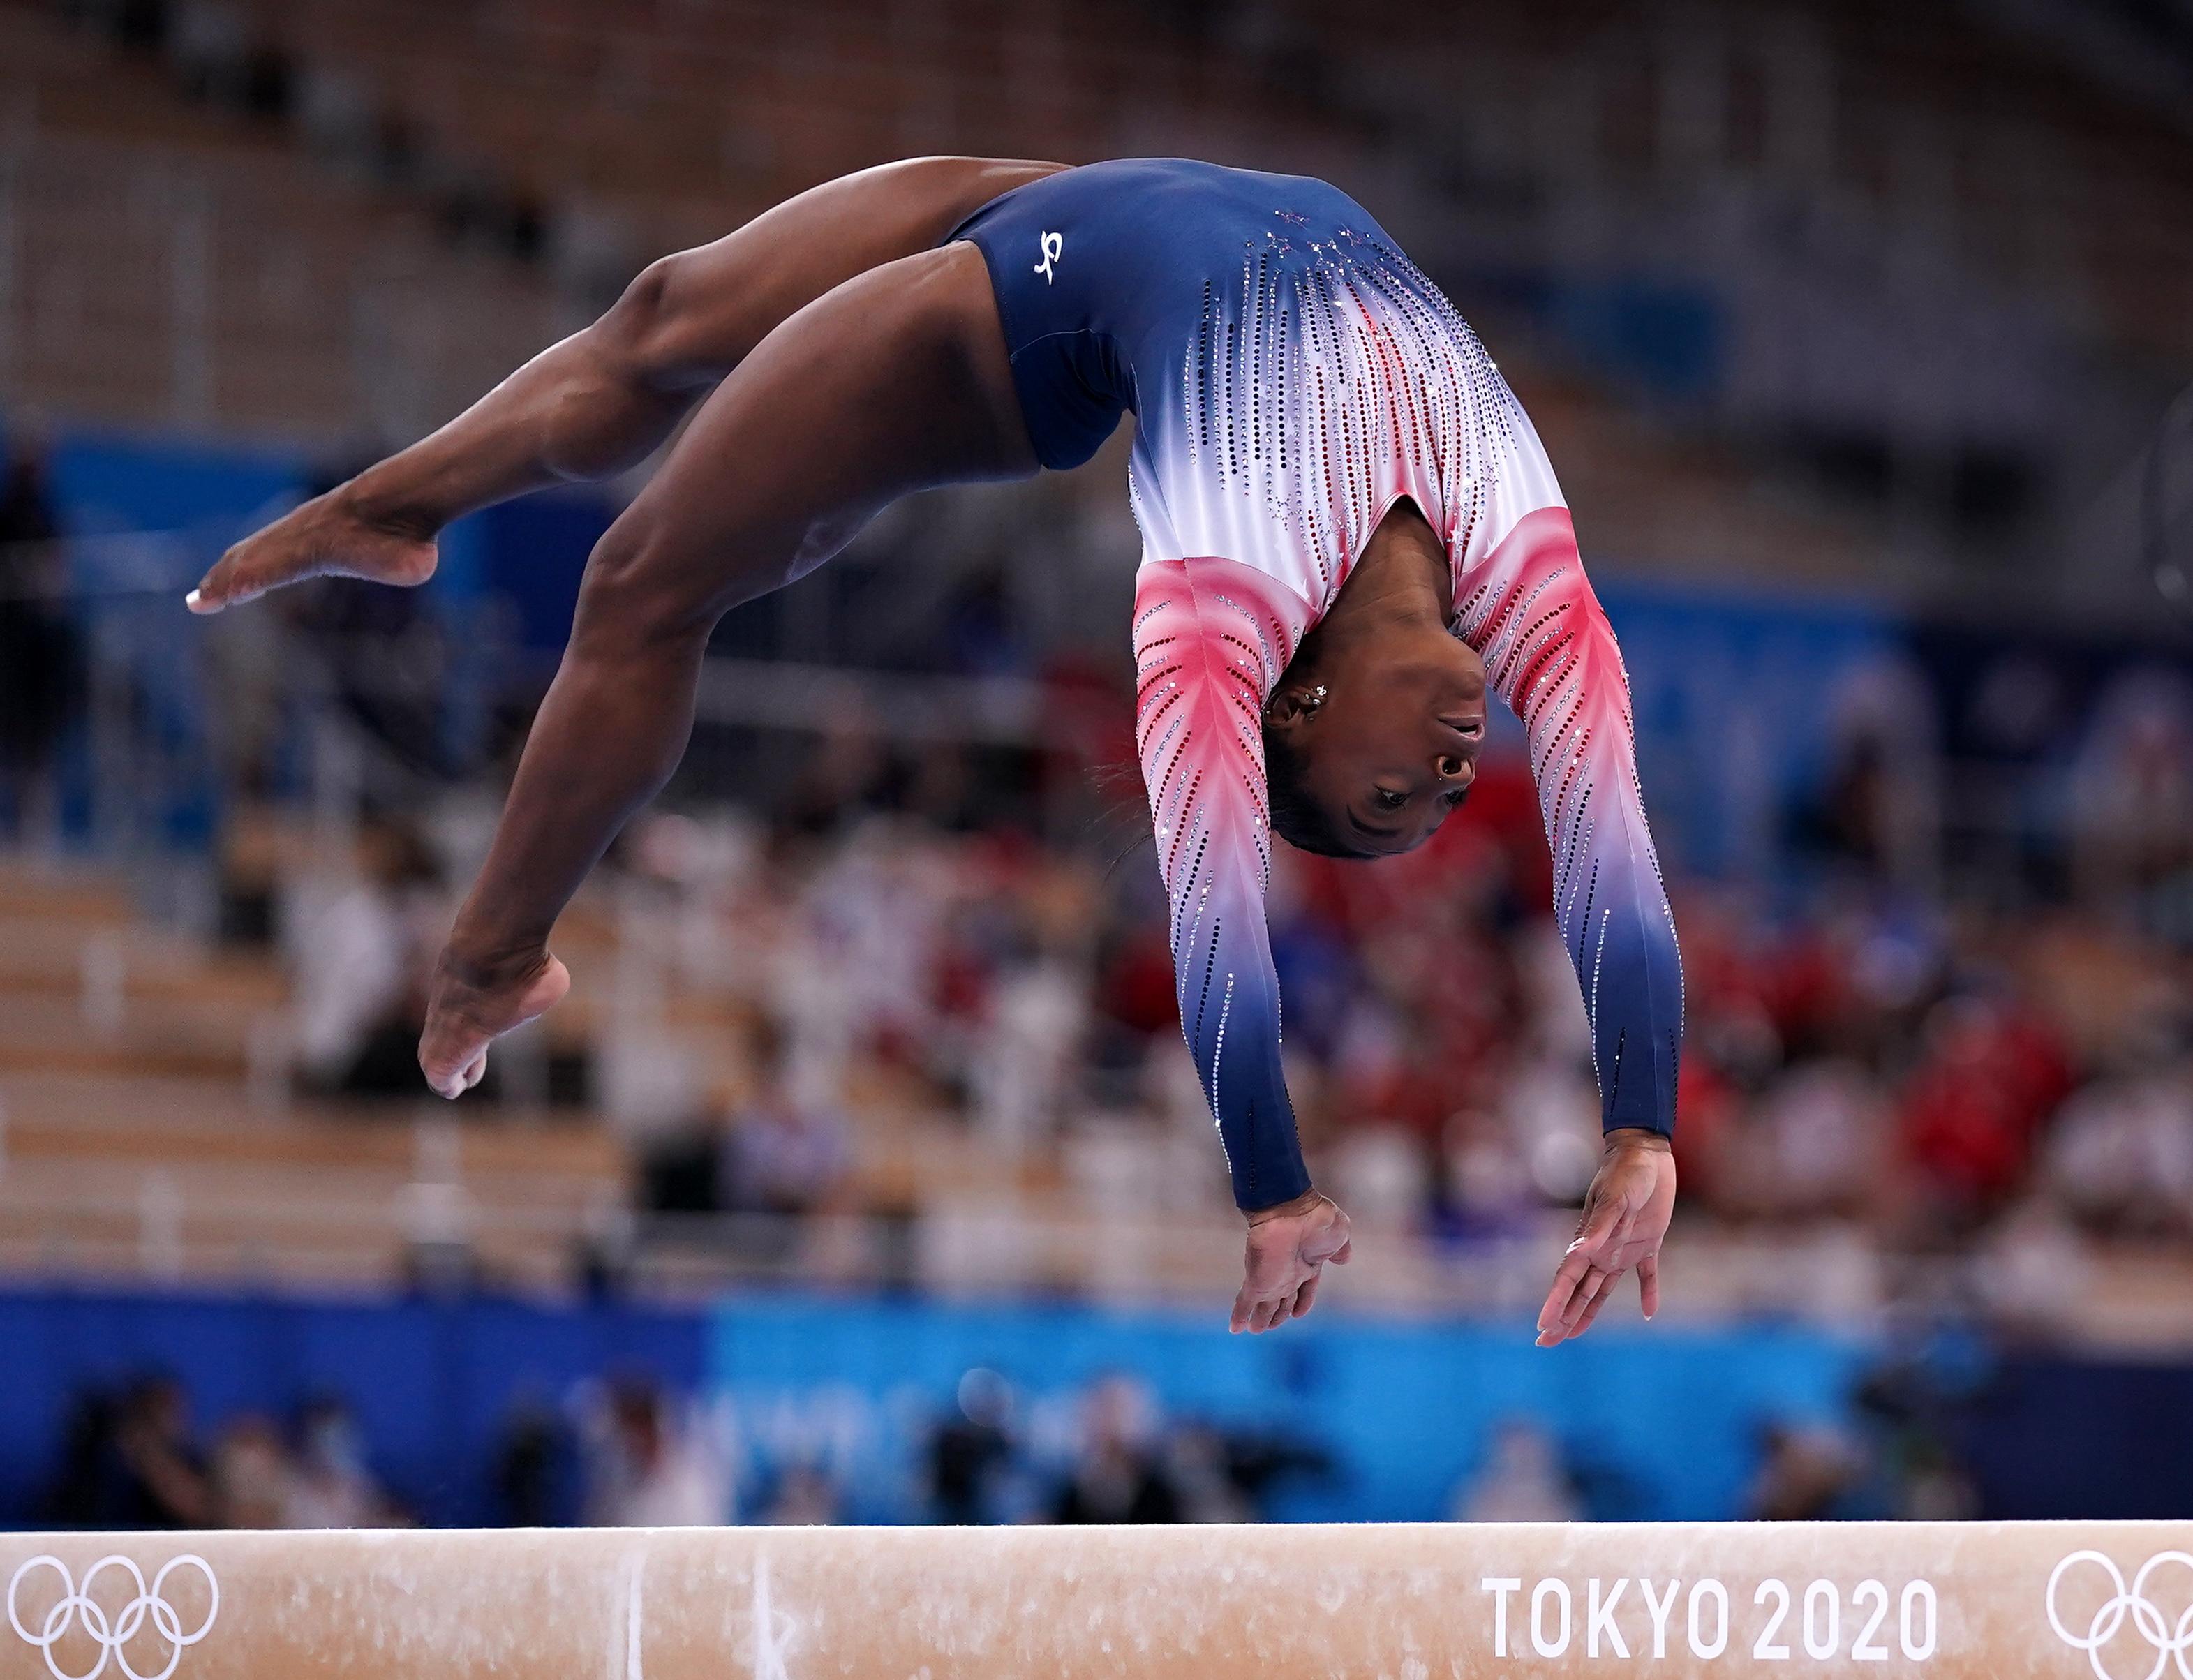 Simone Biles in the women's balance beam final